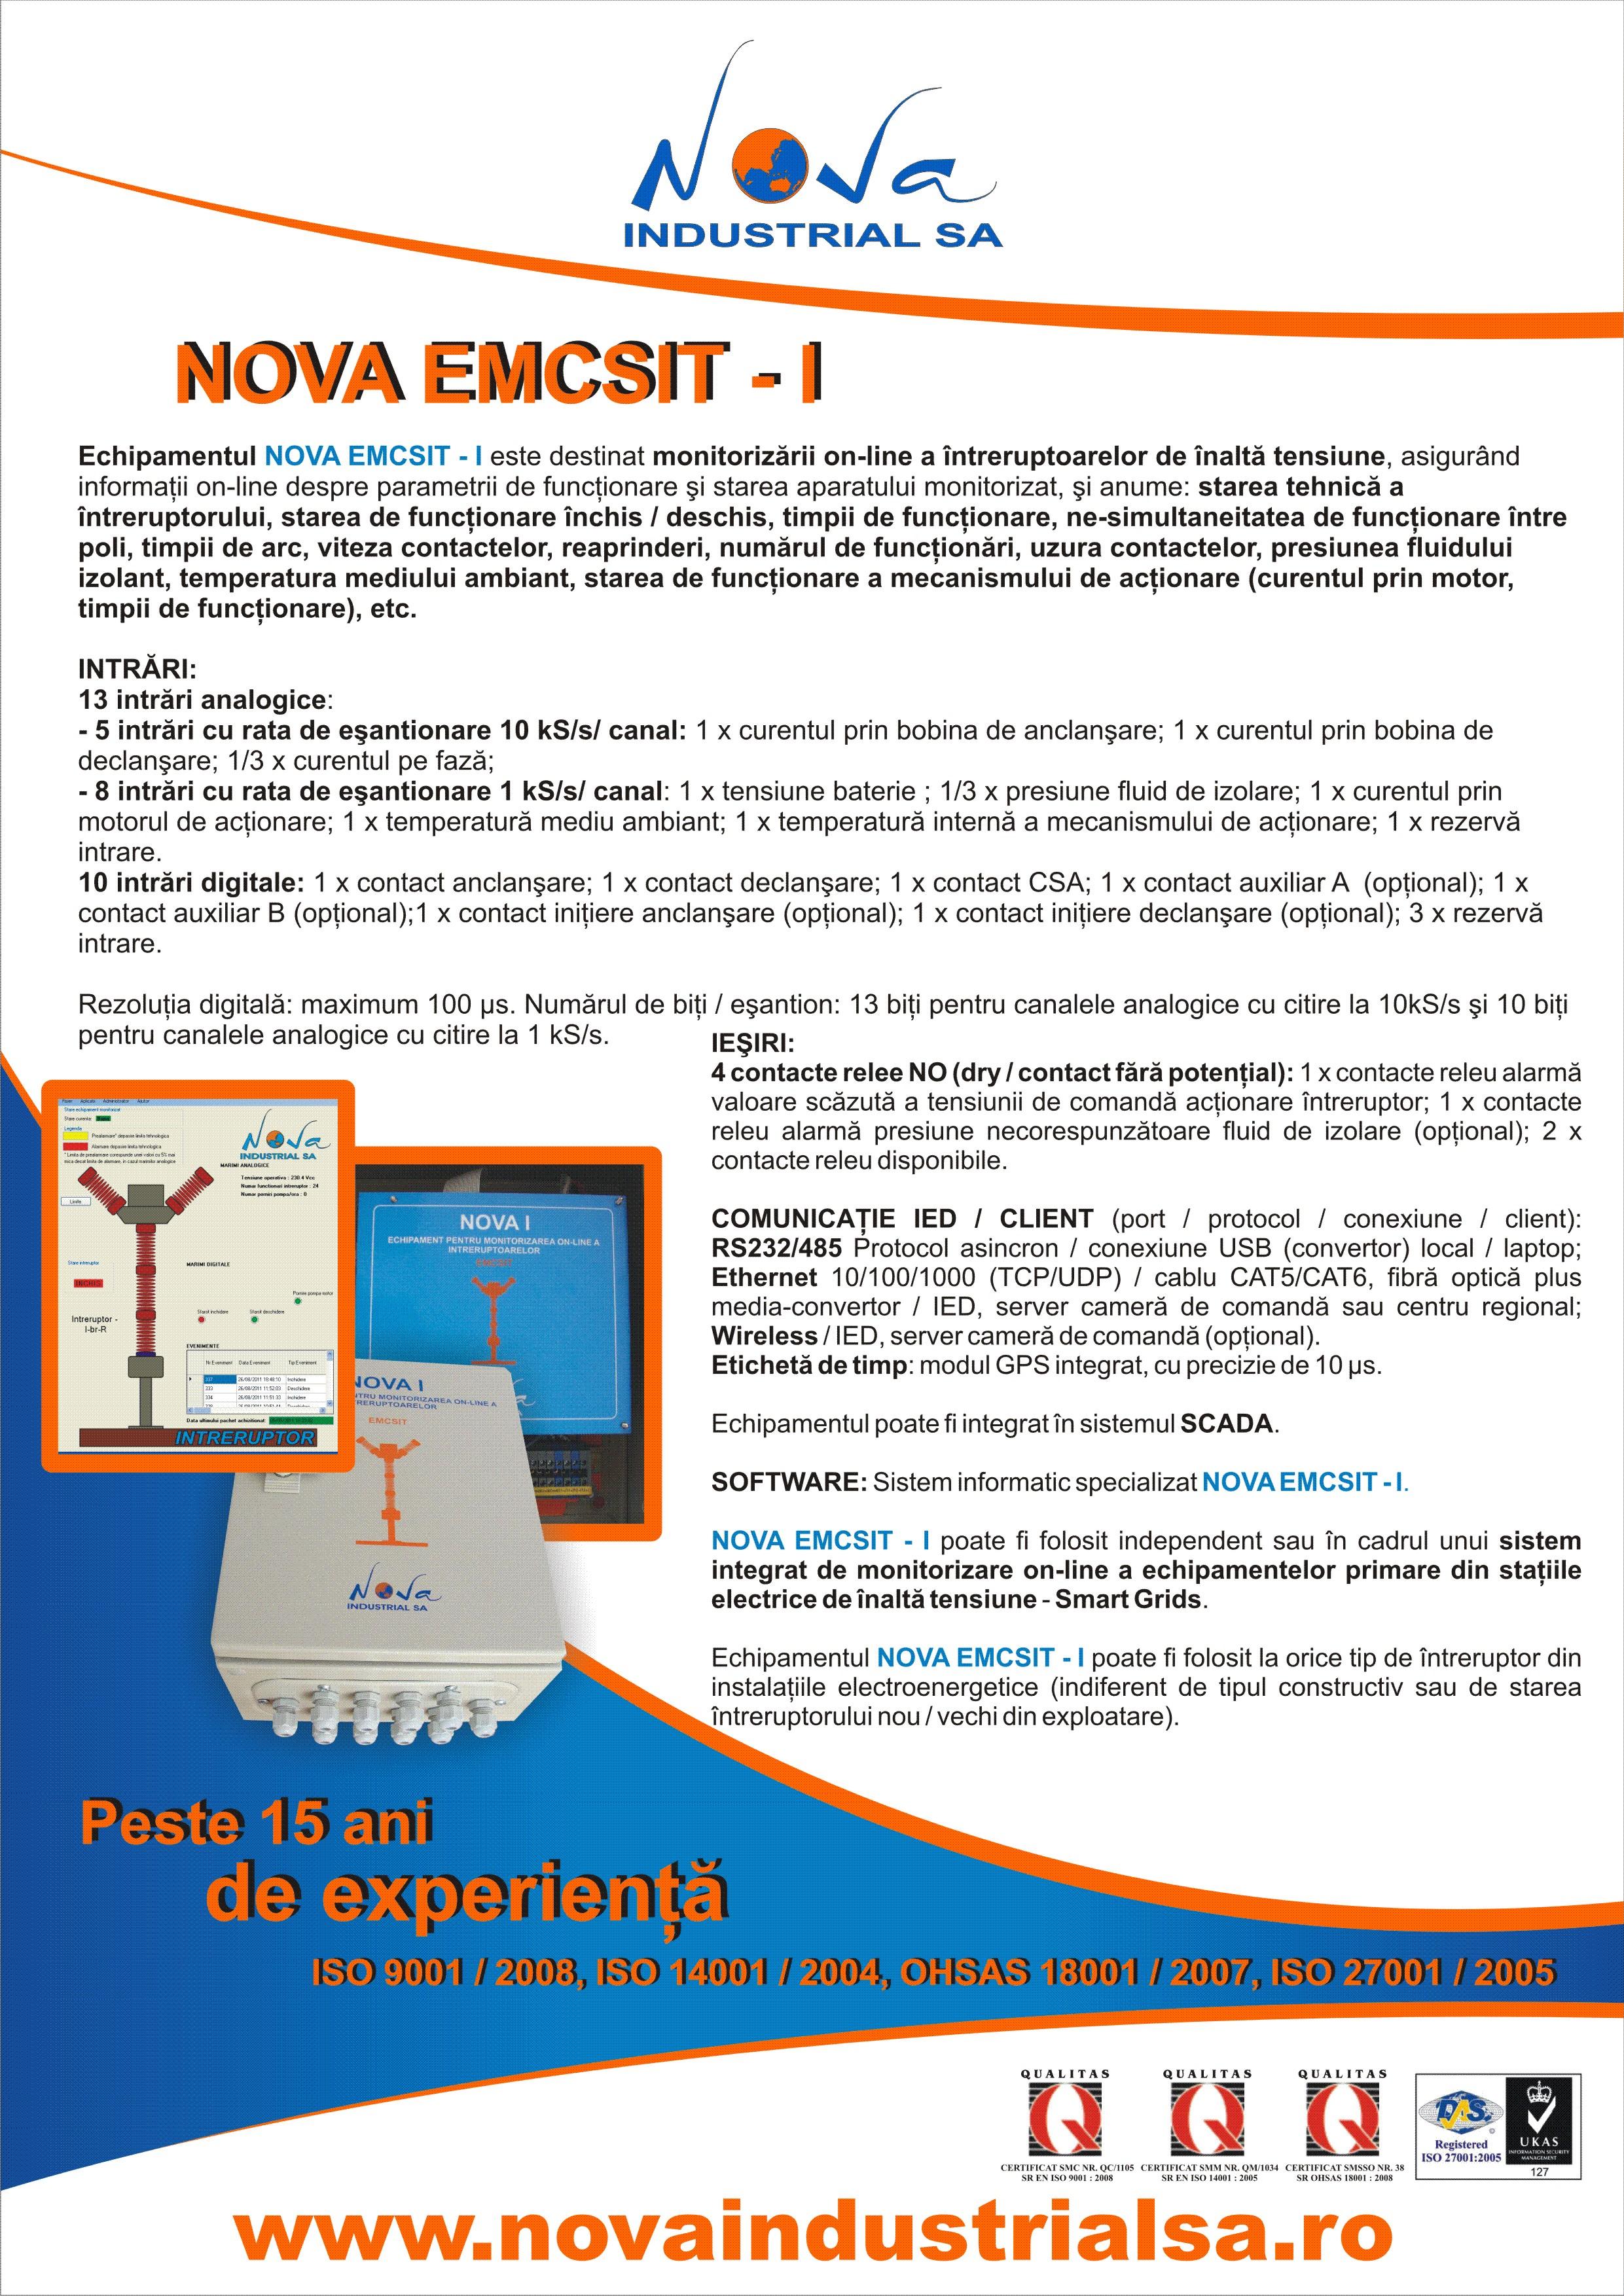 NOVA EMCSIT - I